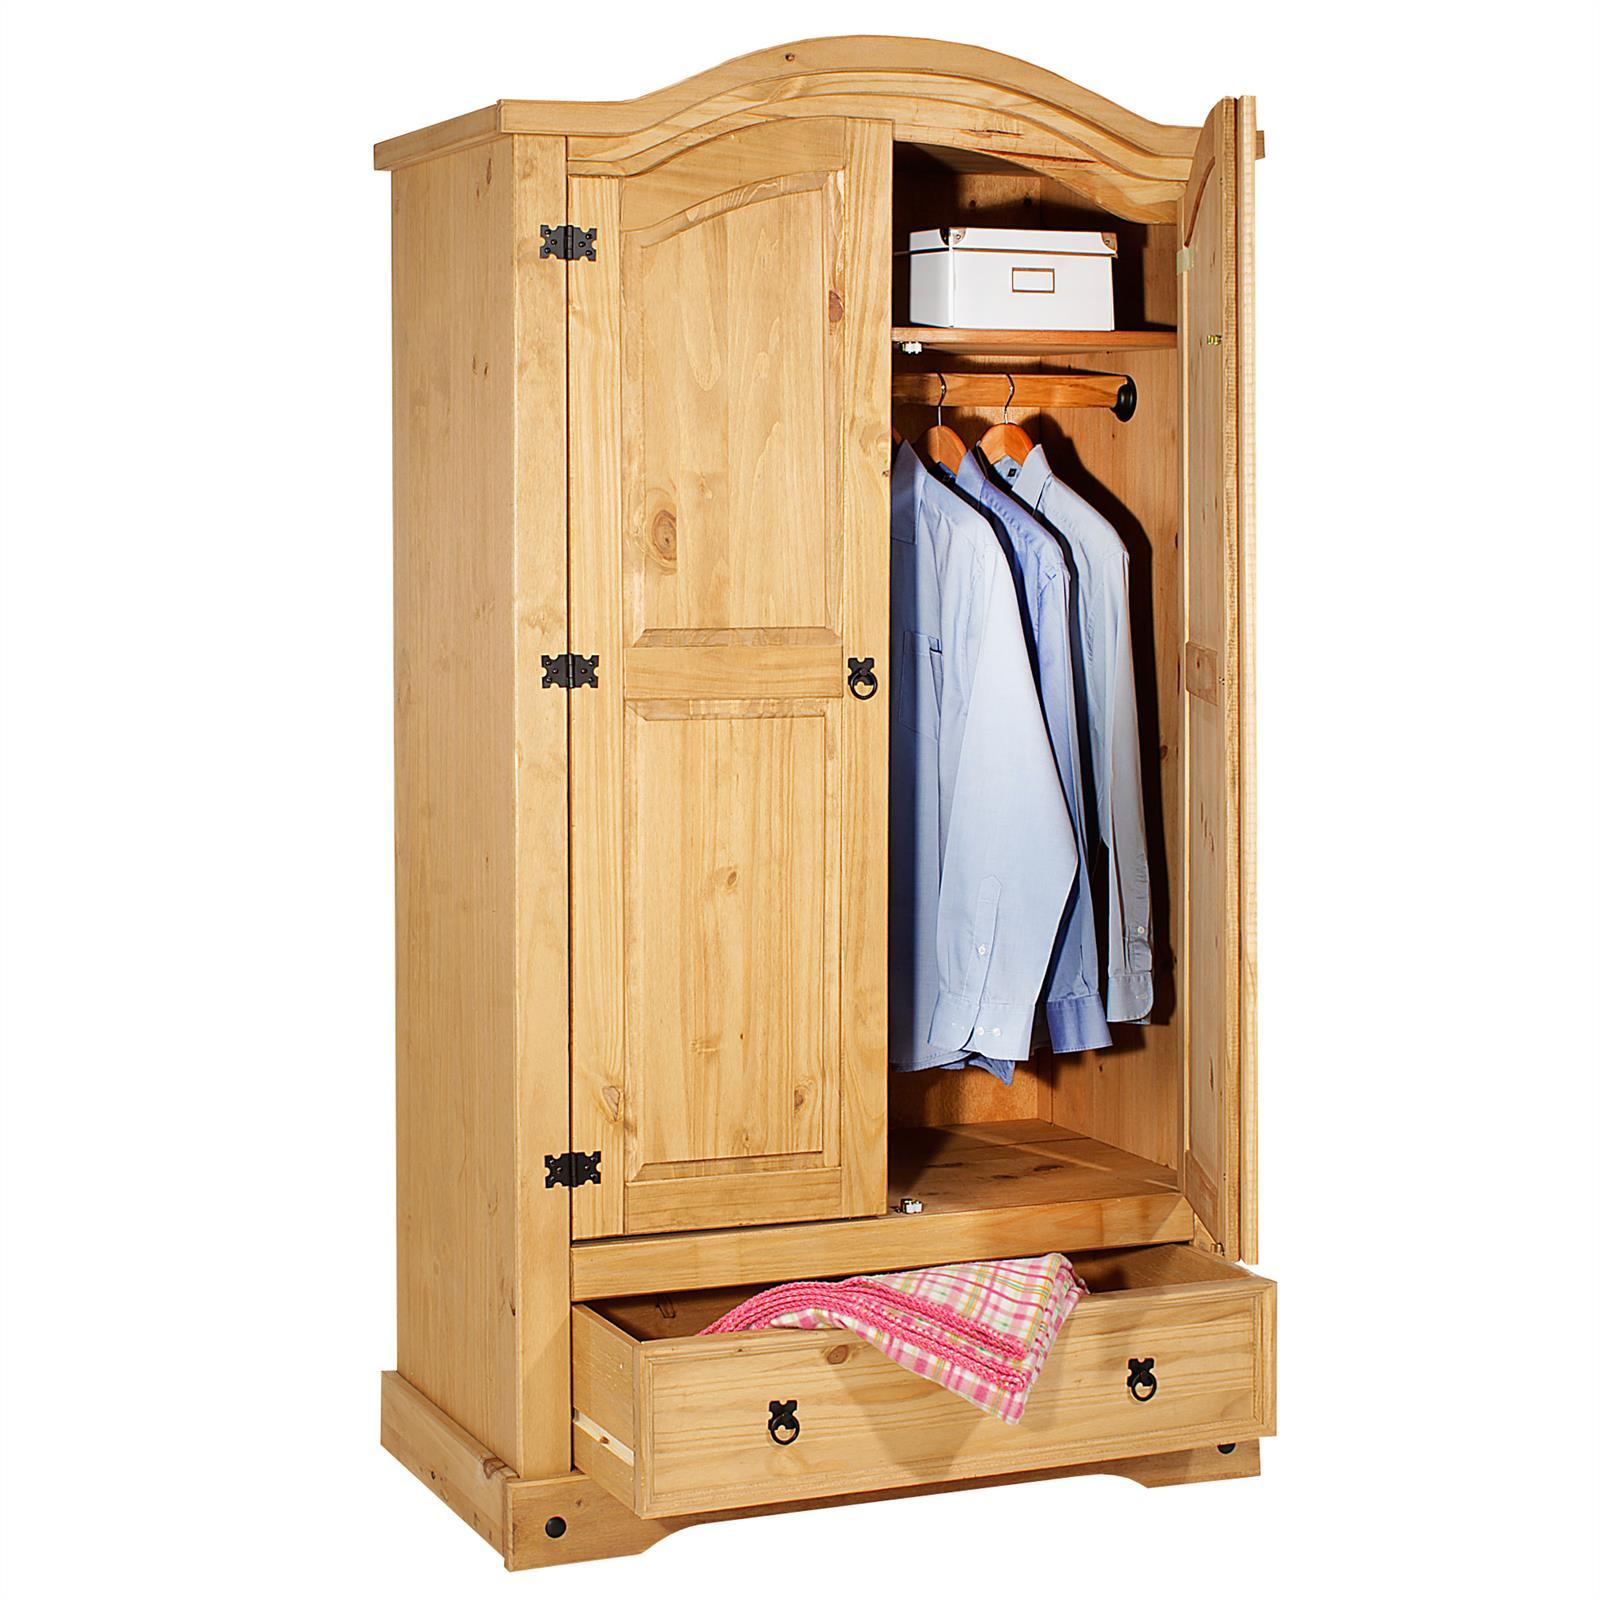 armoire en pin salsa style mexicain 2 portes et 1 tiroir. Black Bedroom Furniture Sets. Home Design Ideas